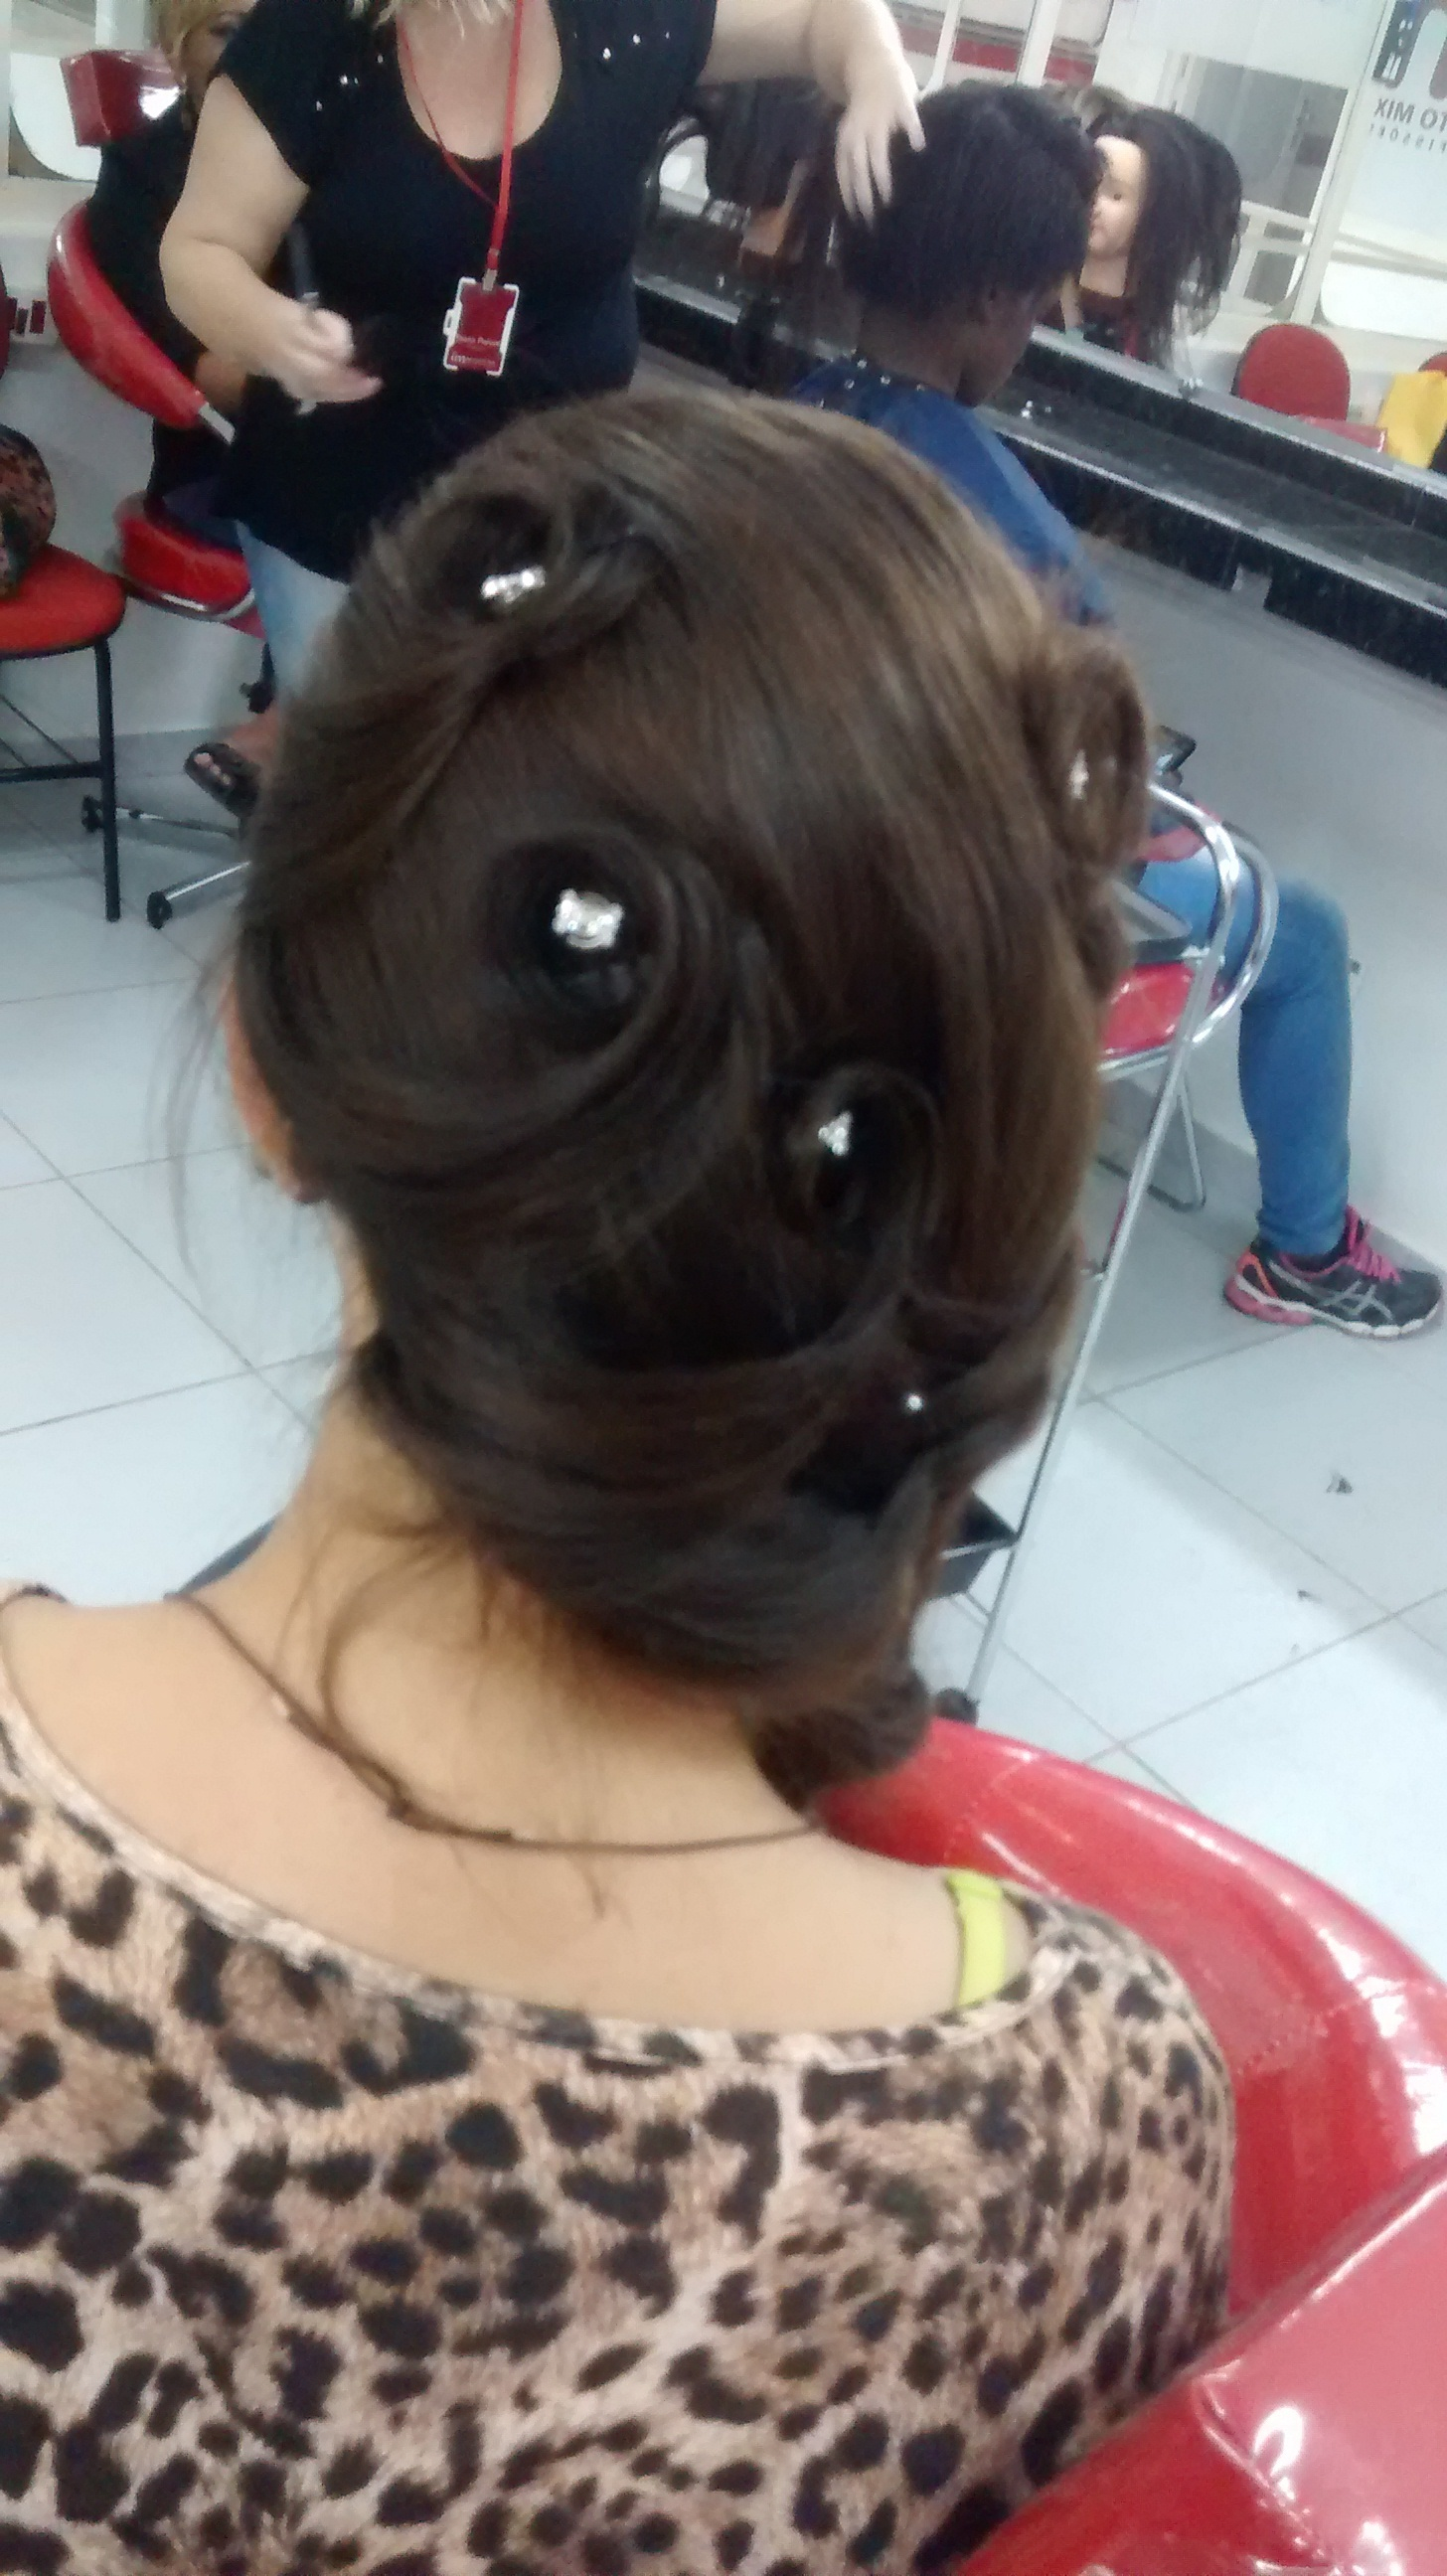 auxiliar cabeleireiro(a) estudante manicure e pedicure